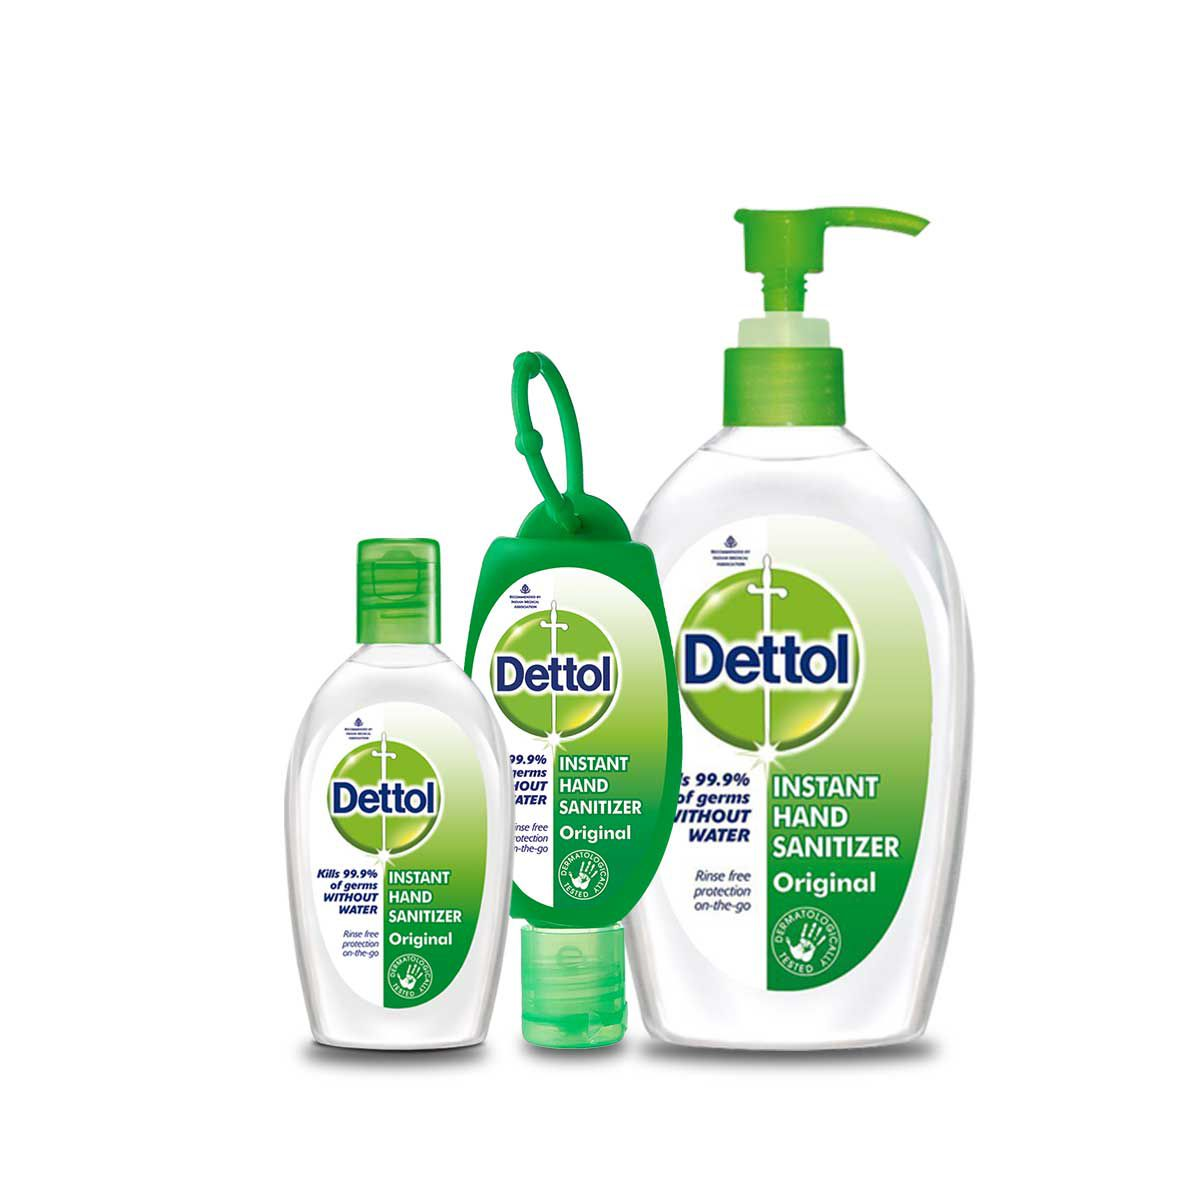 Dettol Refresh Instant Hand Sanitizer 50ml The Warehouse